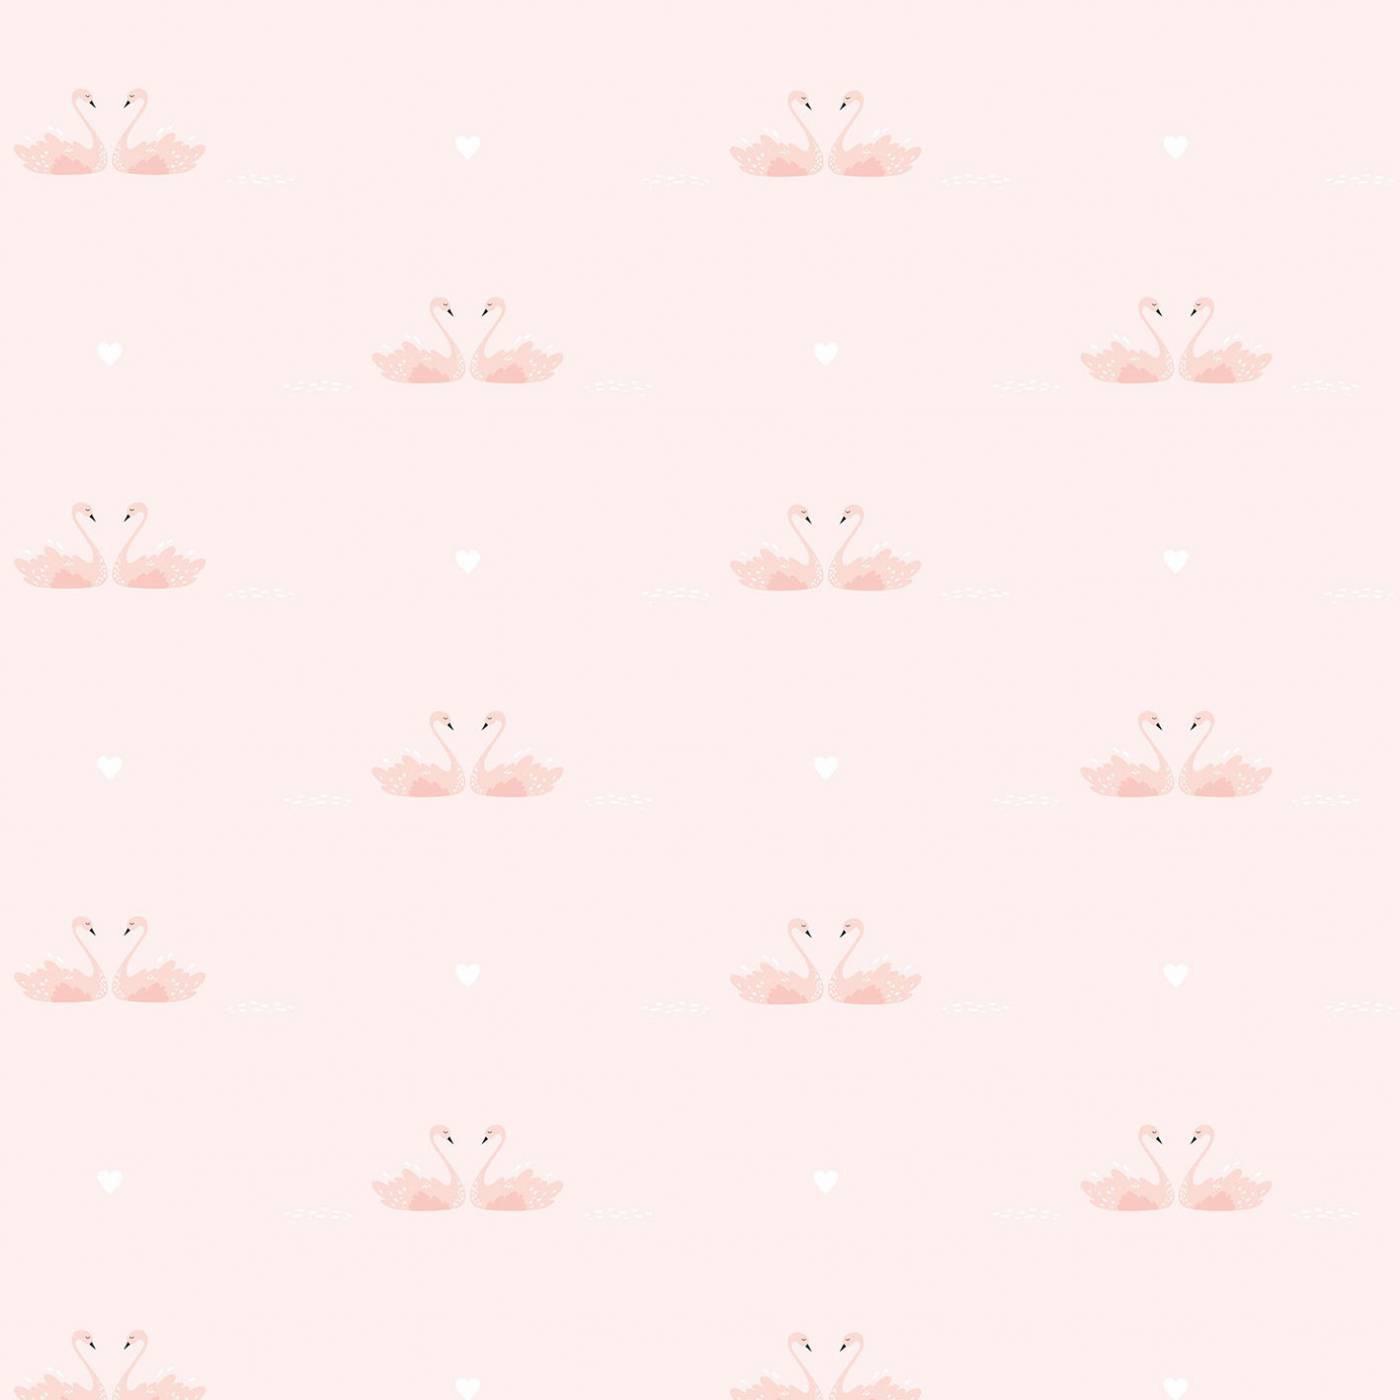 Papel de Parede Cisne Rosa